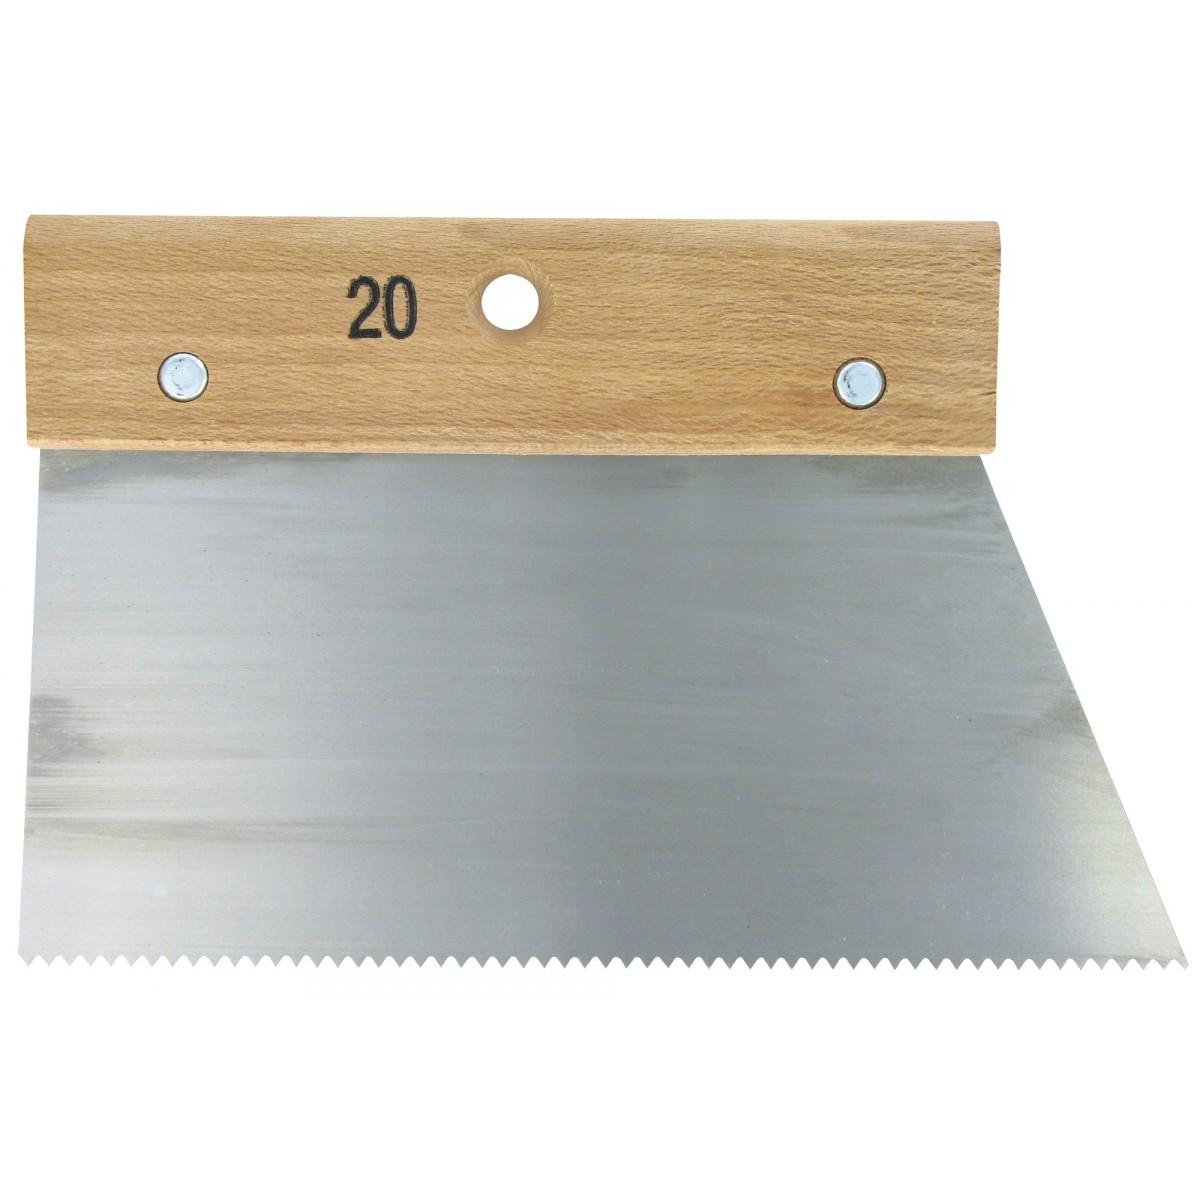 couteau colle outibat denture pointue normale 250 g m dimensions 200 mm. Black Bedroom Furniture Sets. Home Design Ideas